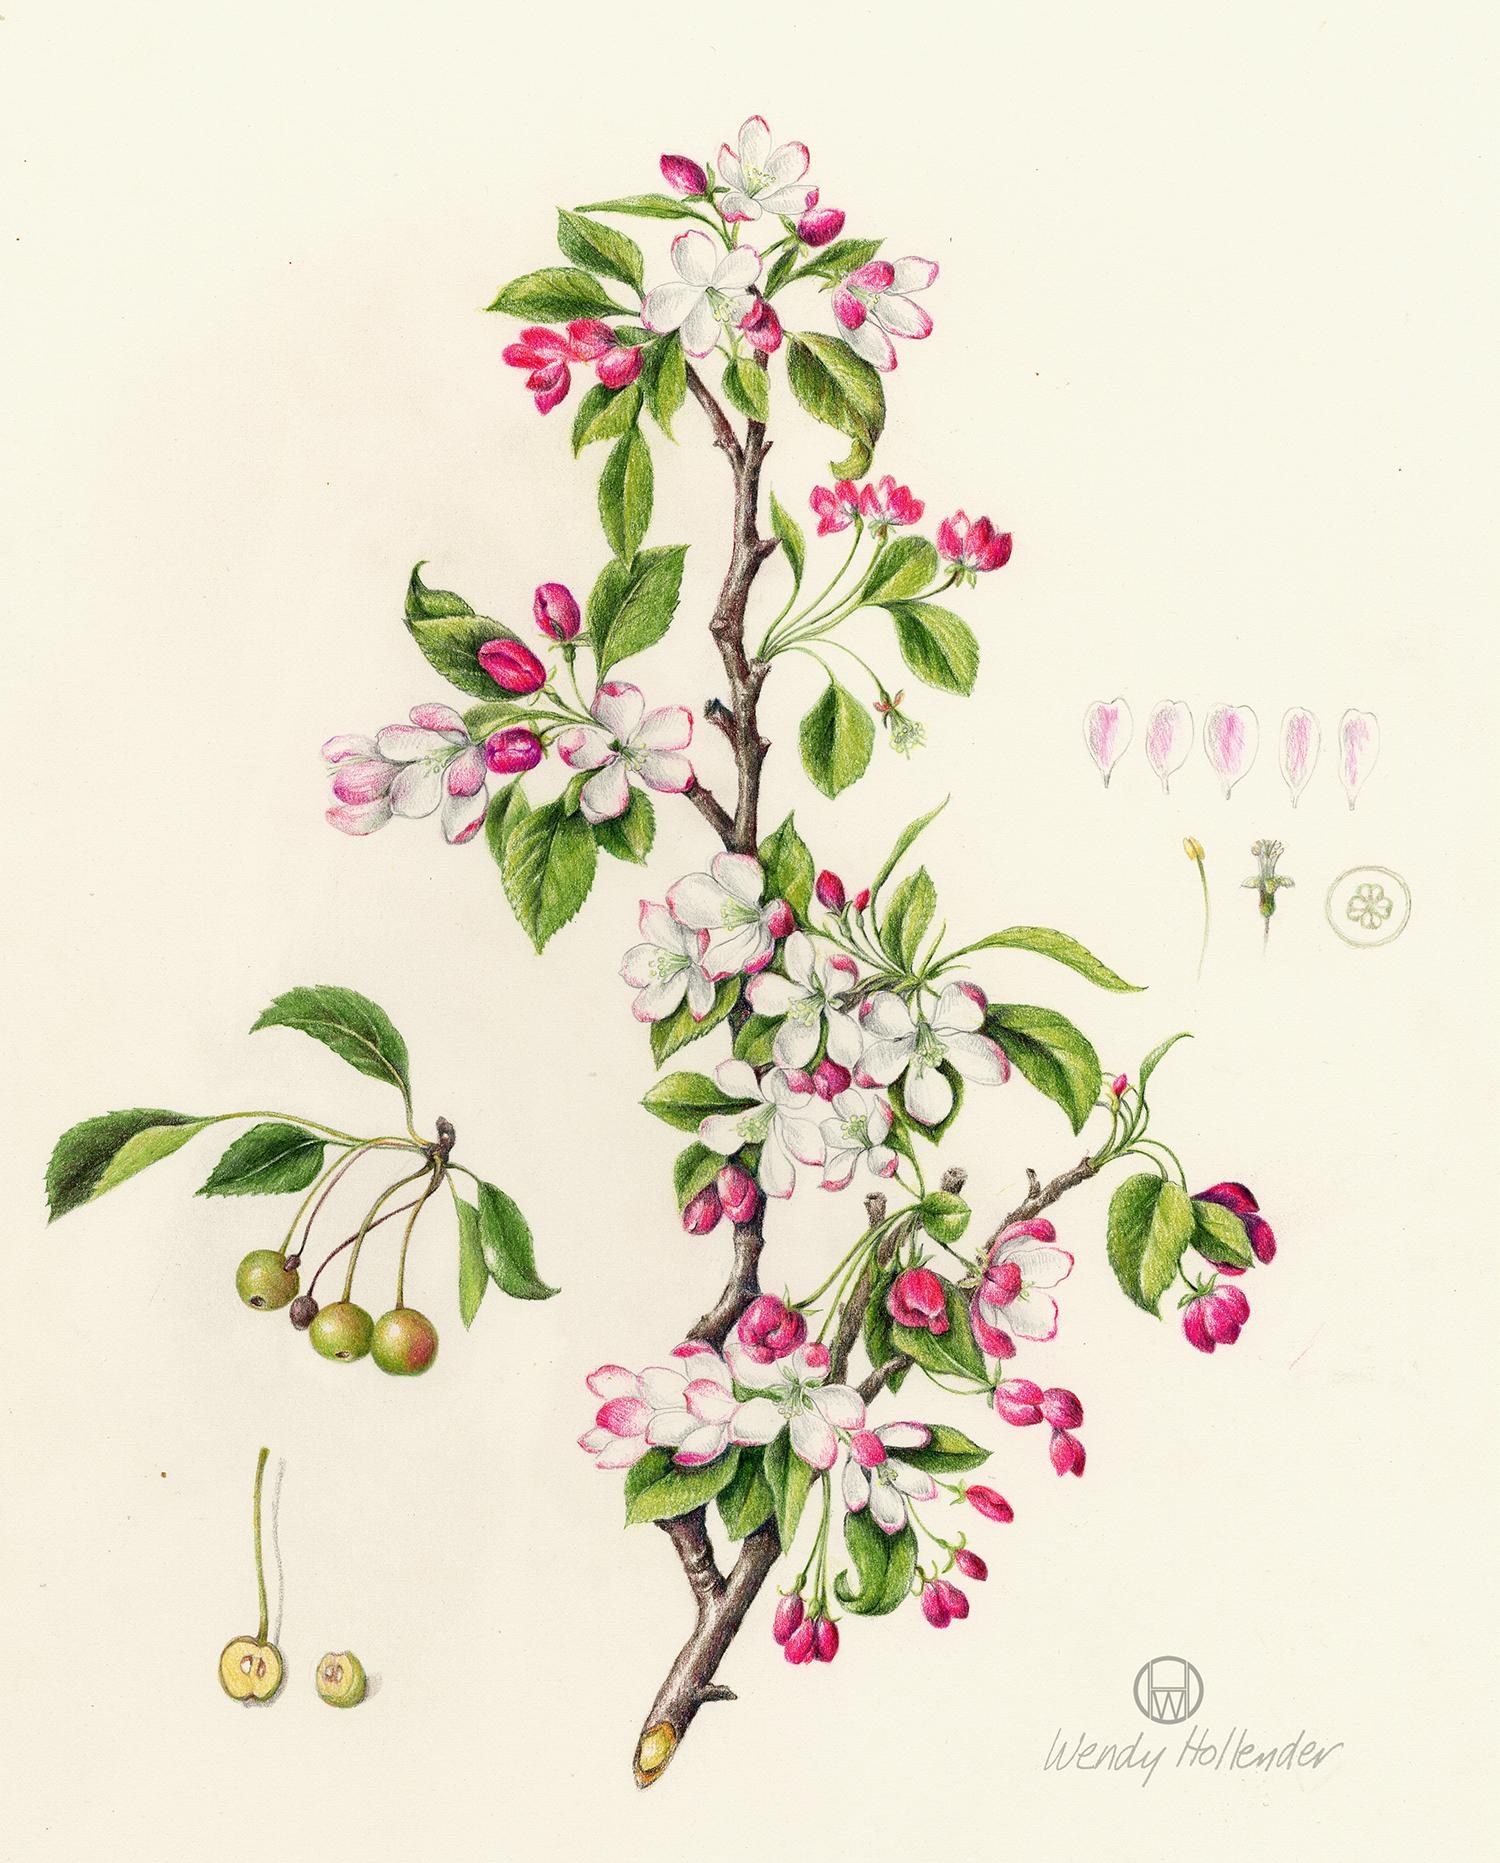 Crab Apple - Malus floribunda